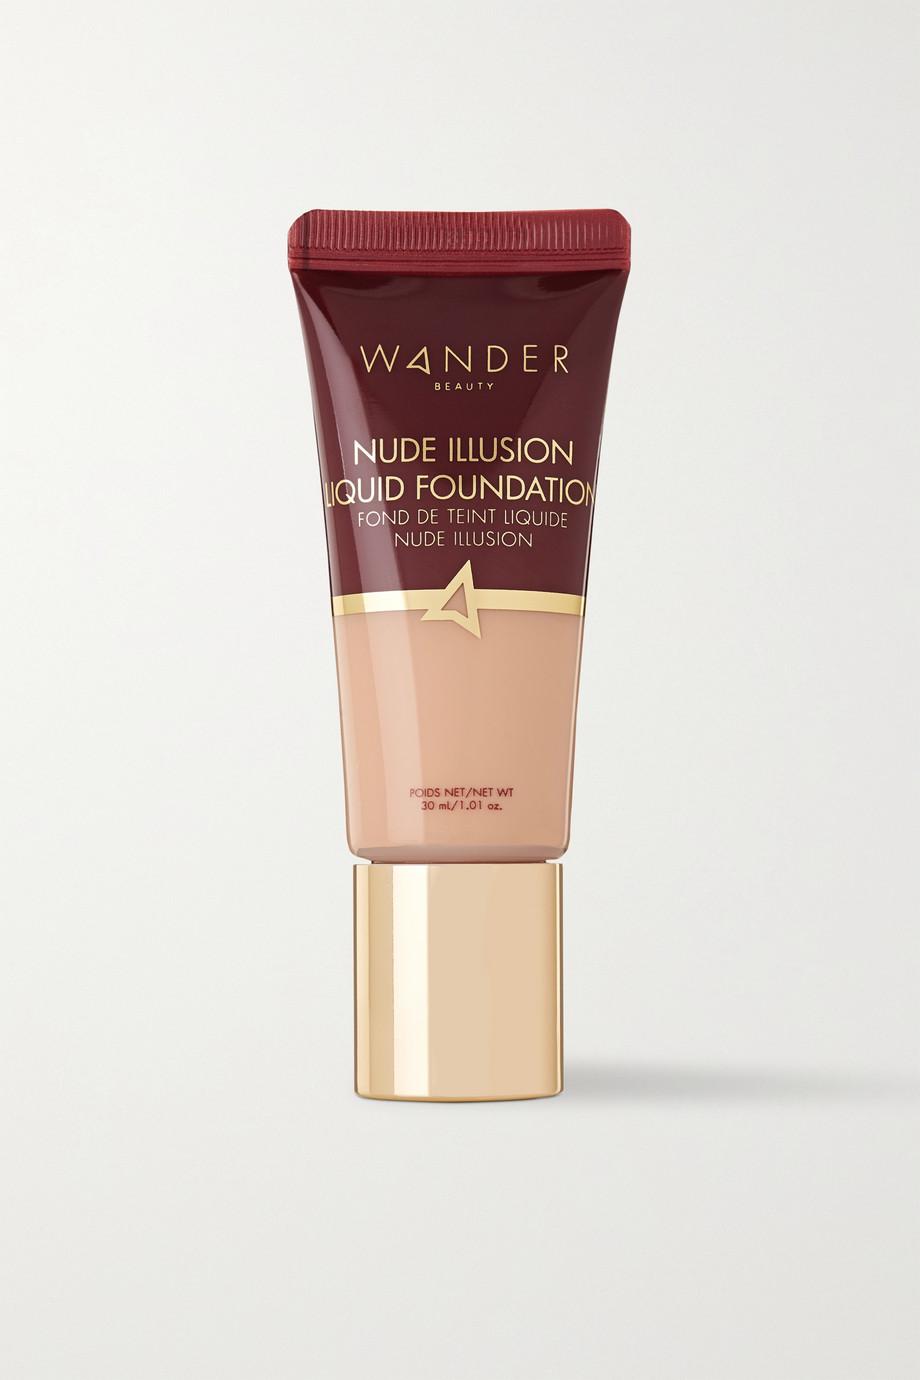 Wander Beauty Nude Illusion Liquid Foundation – Fair Light – Foundation